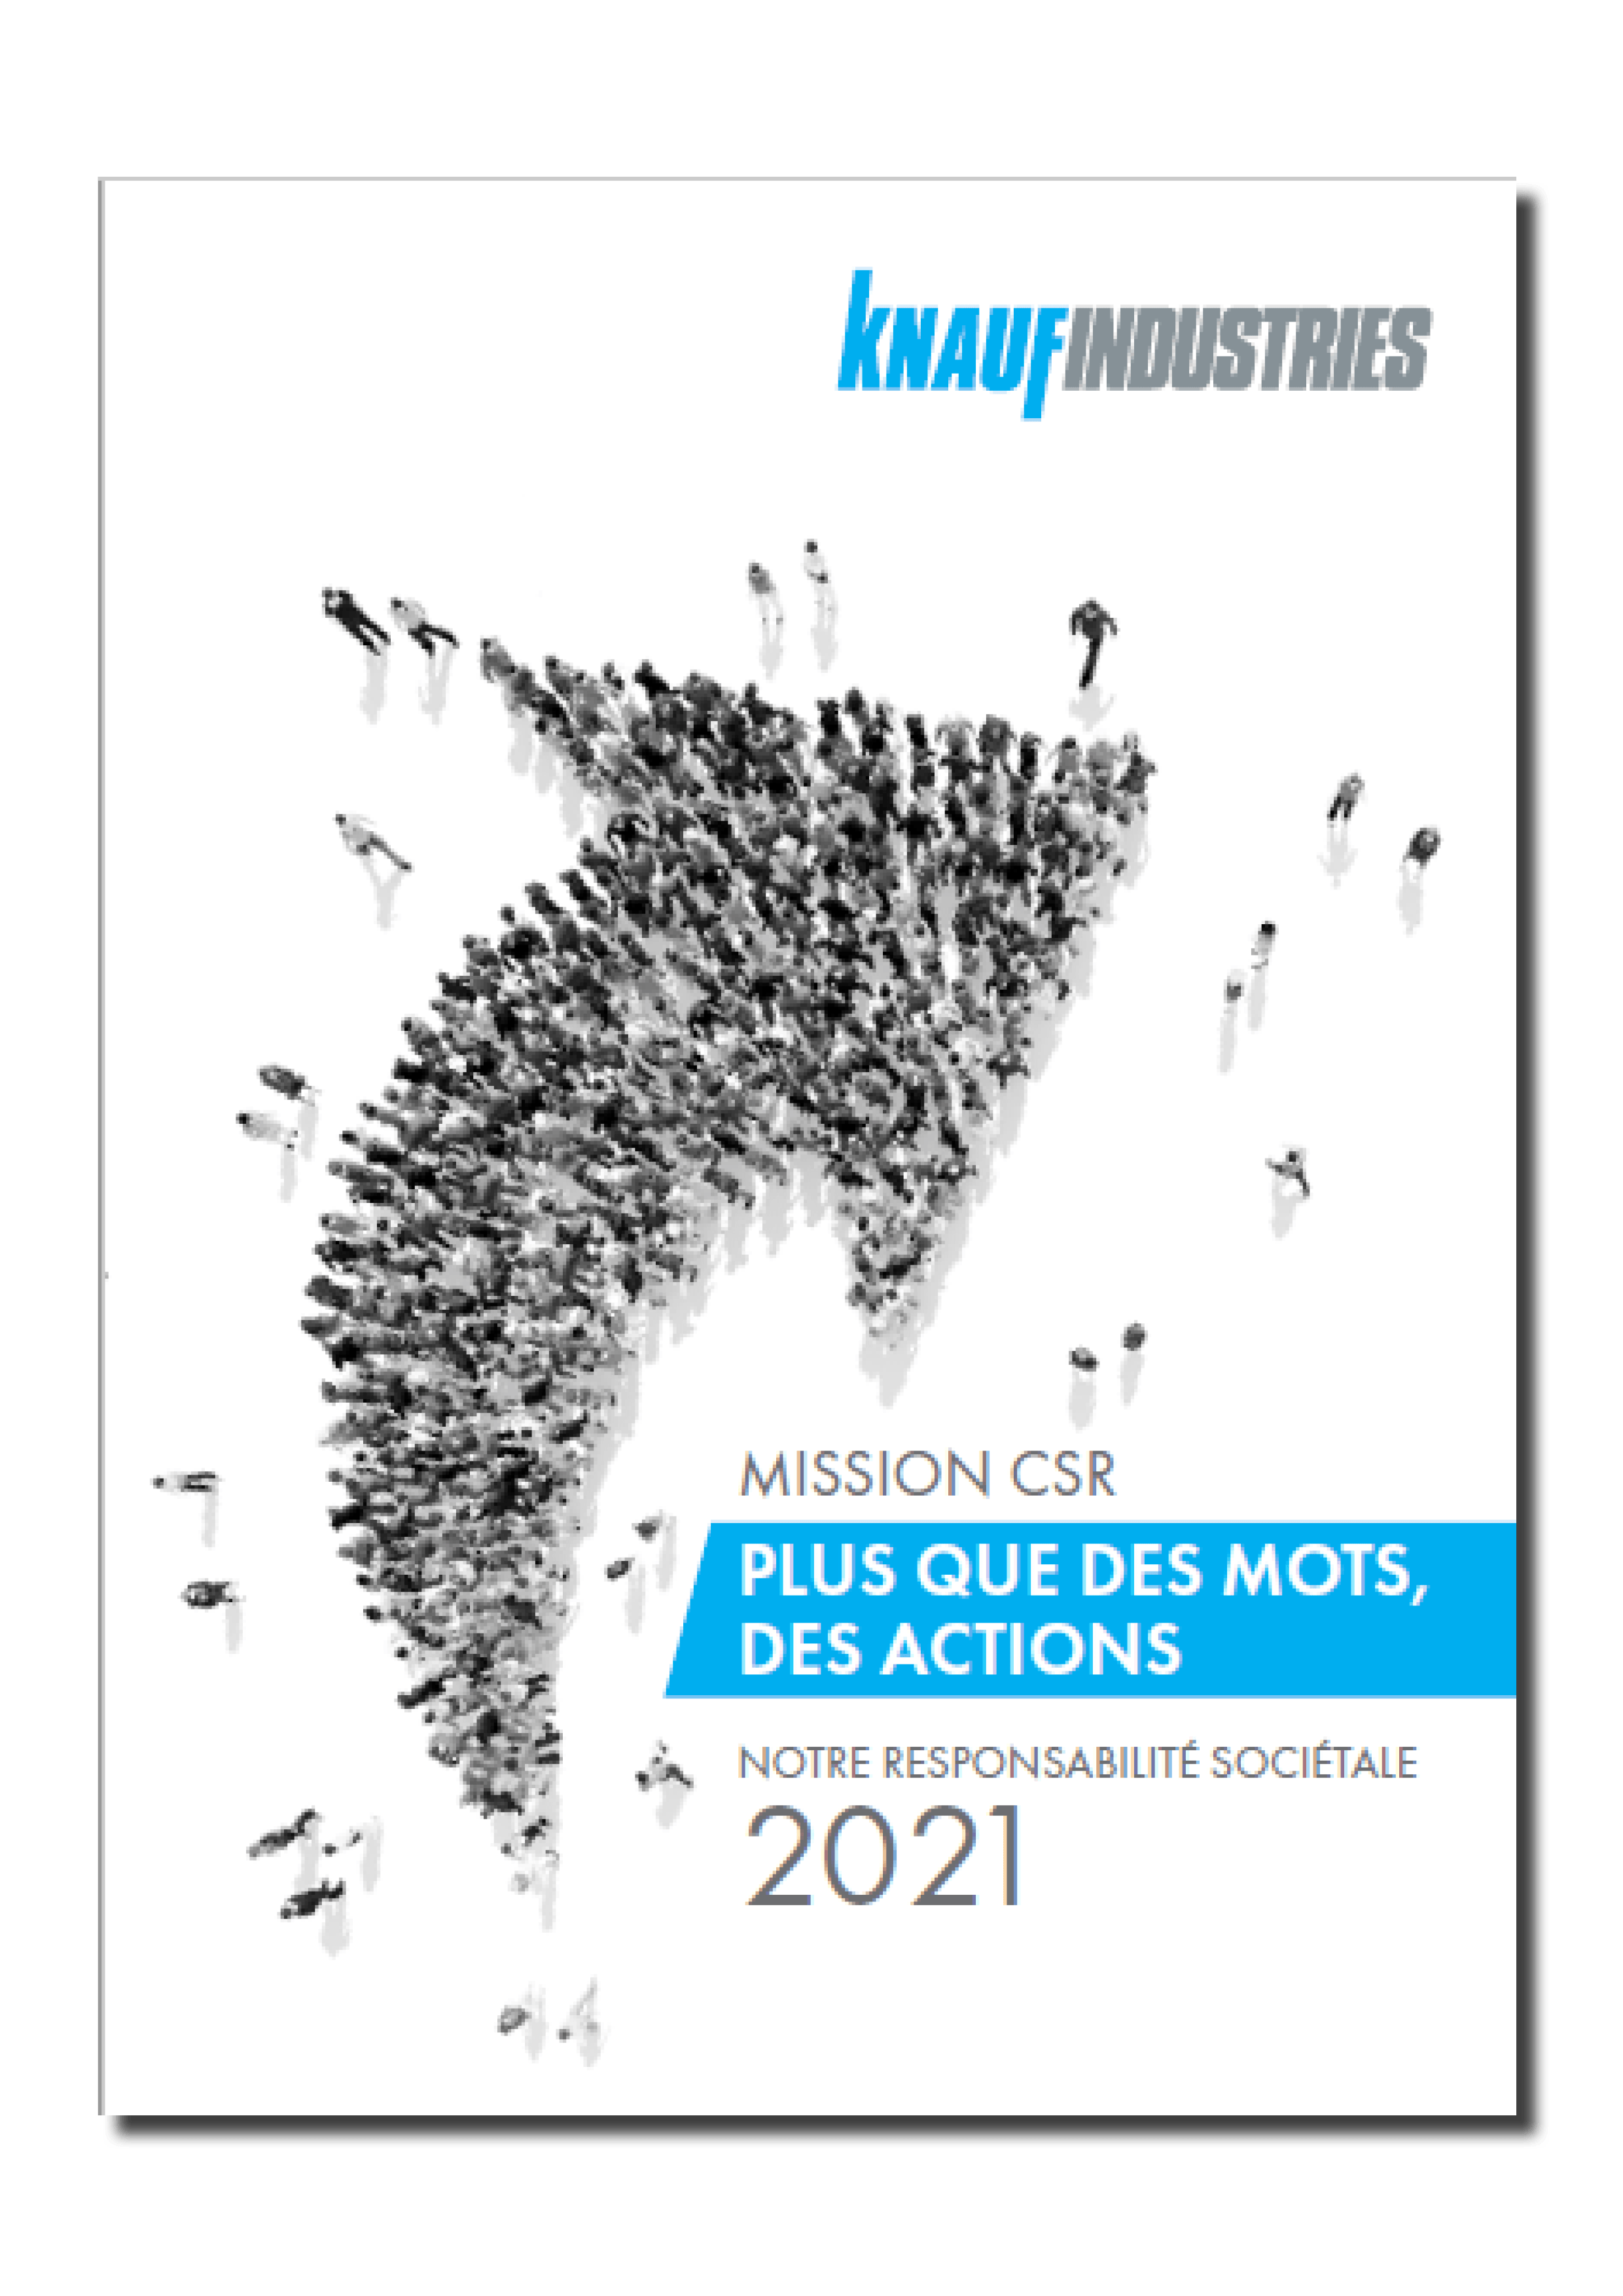 rapport-rse-knauf-industries-2021